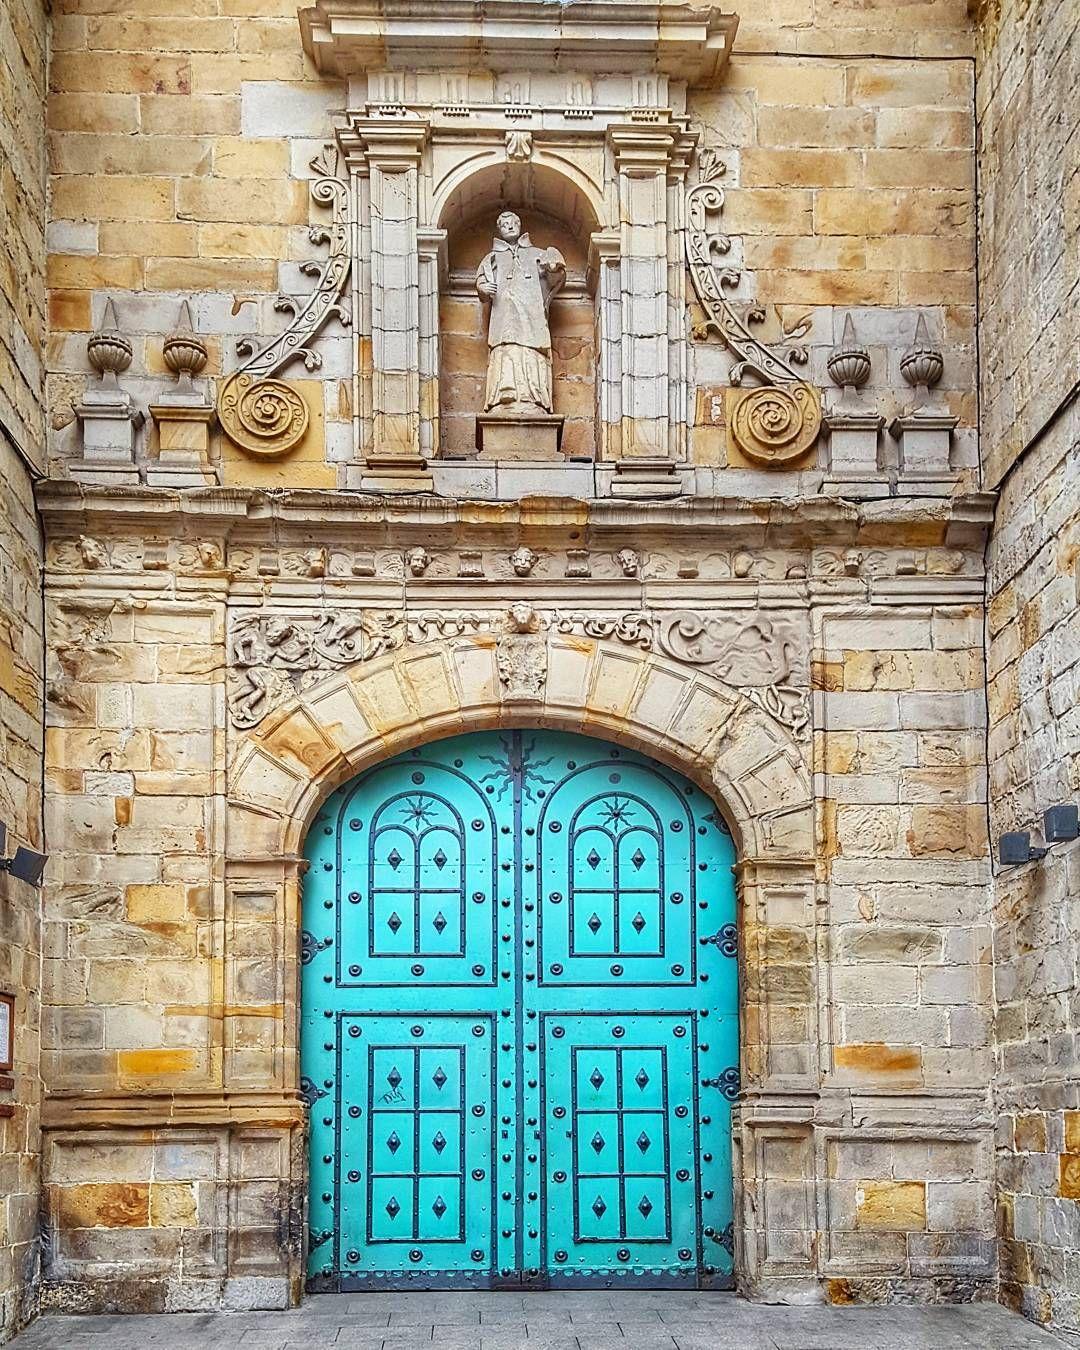 Iglesia San Vicente Mártir De Abando Bilbao Puertas De Entrada Puertas Ventanas Puertas Antiguas